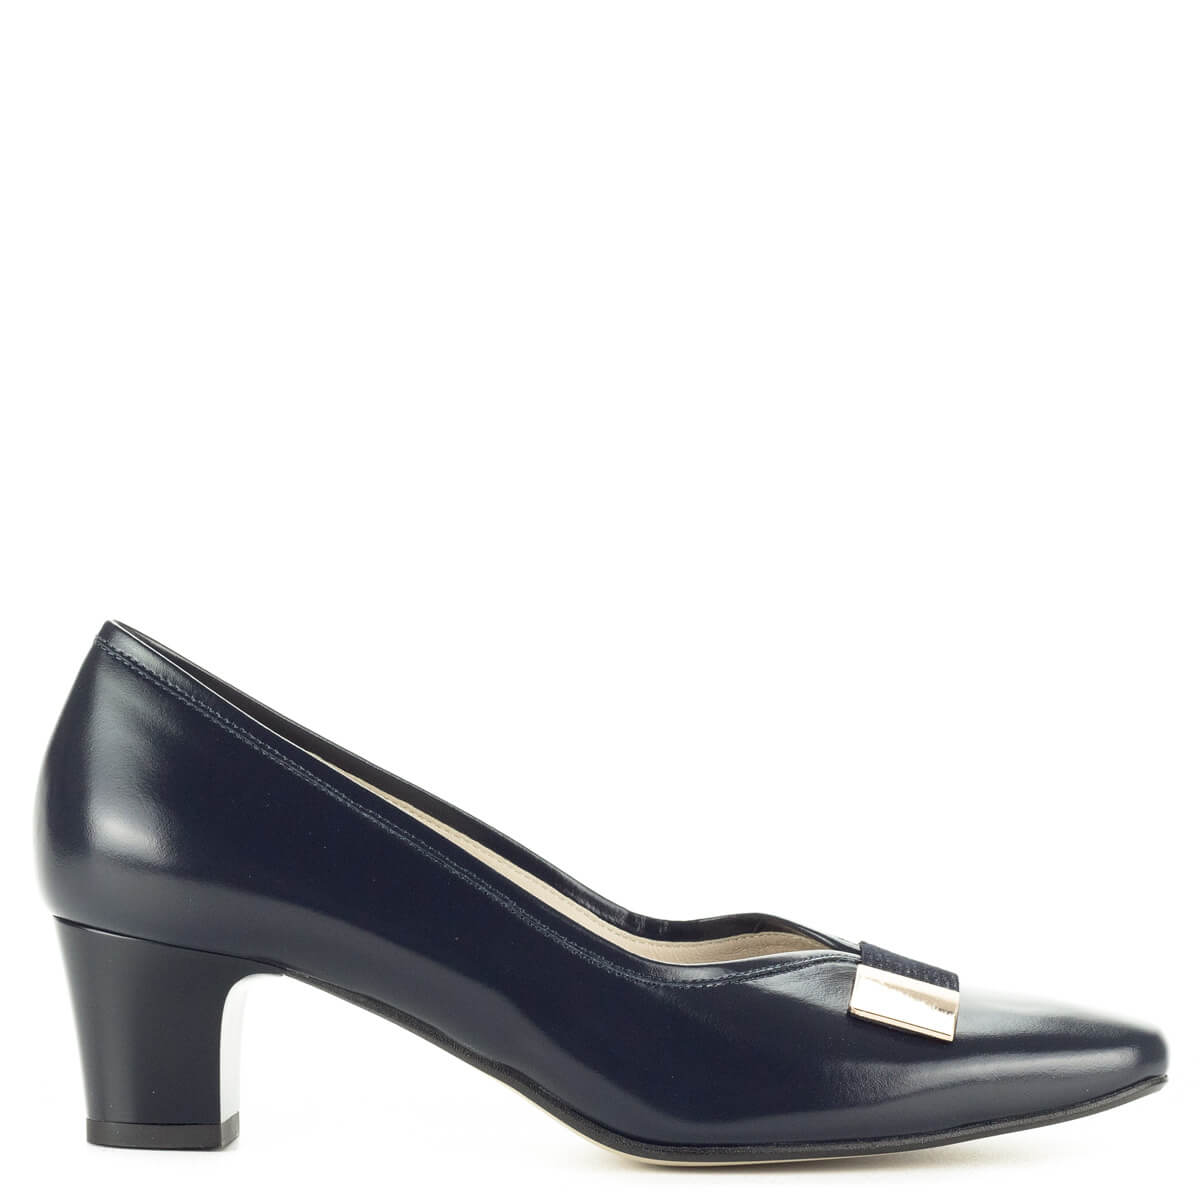 Anis kis sarkú kék női bőr cipő 5 cm magas sarokkal 7826879464